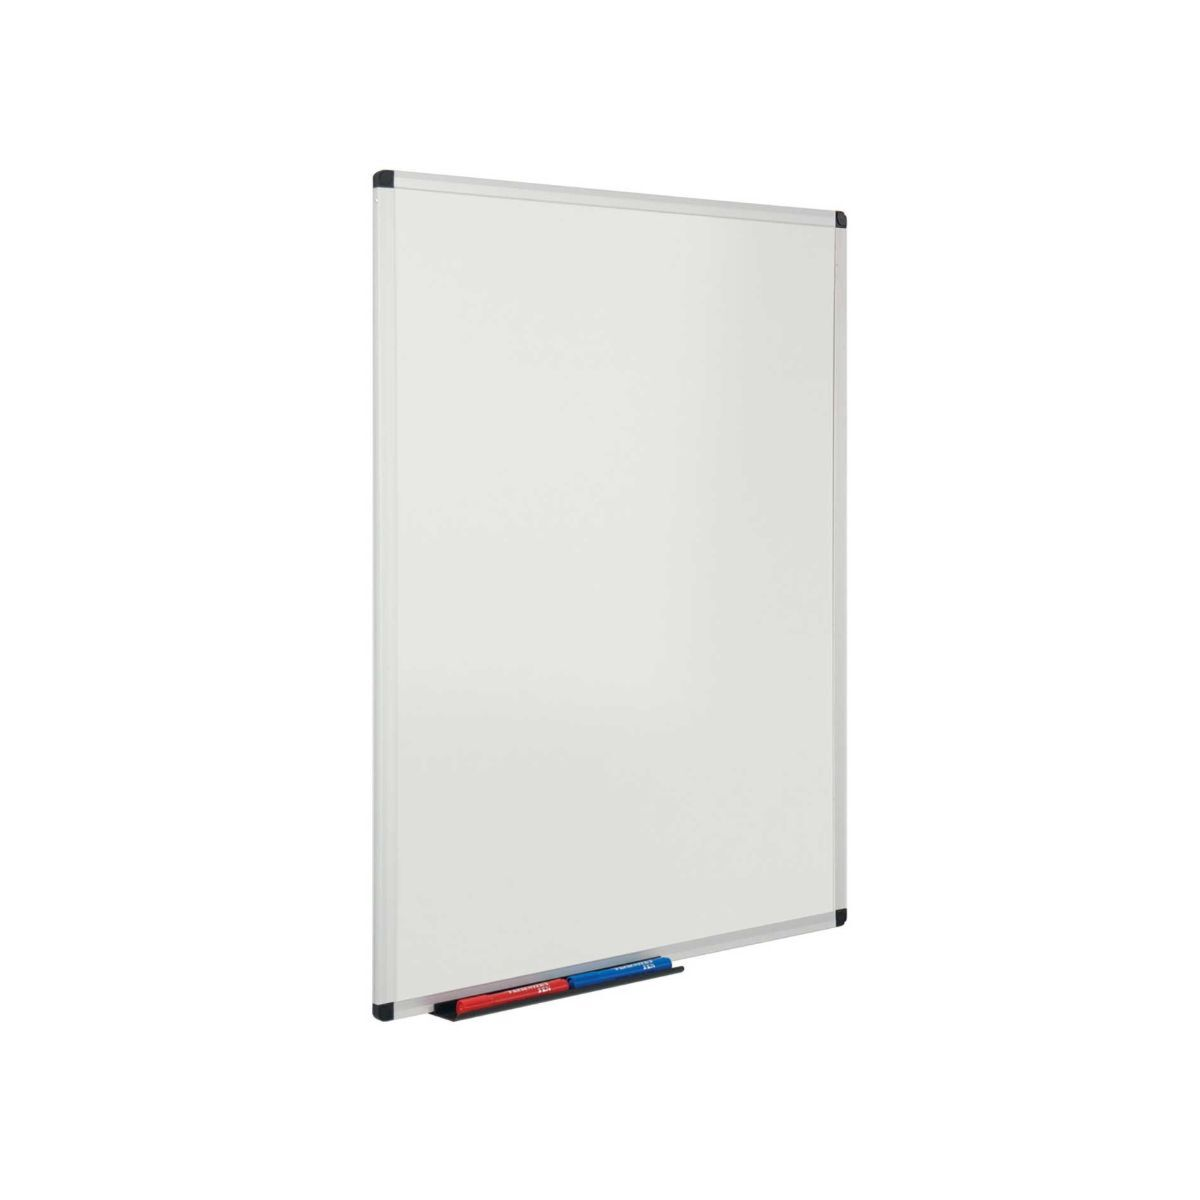 Metroplan Magnetic Dry Wipe Board 900x600mm